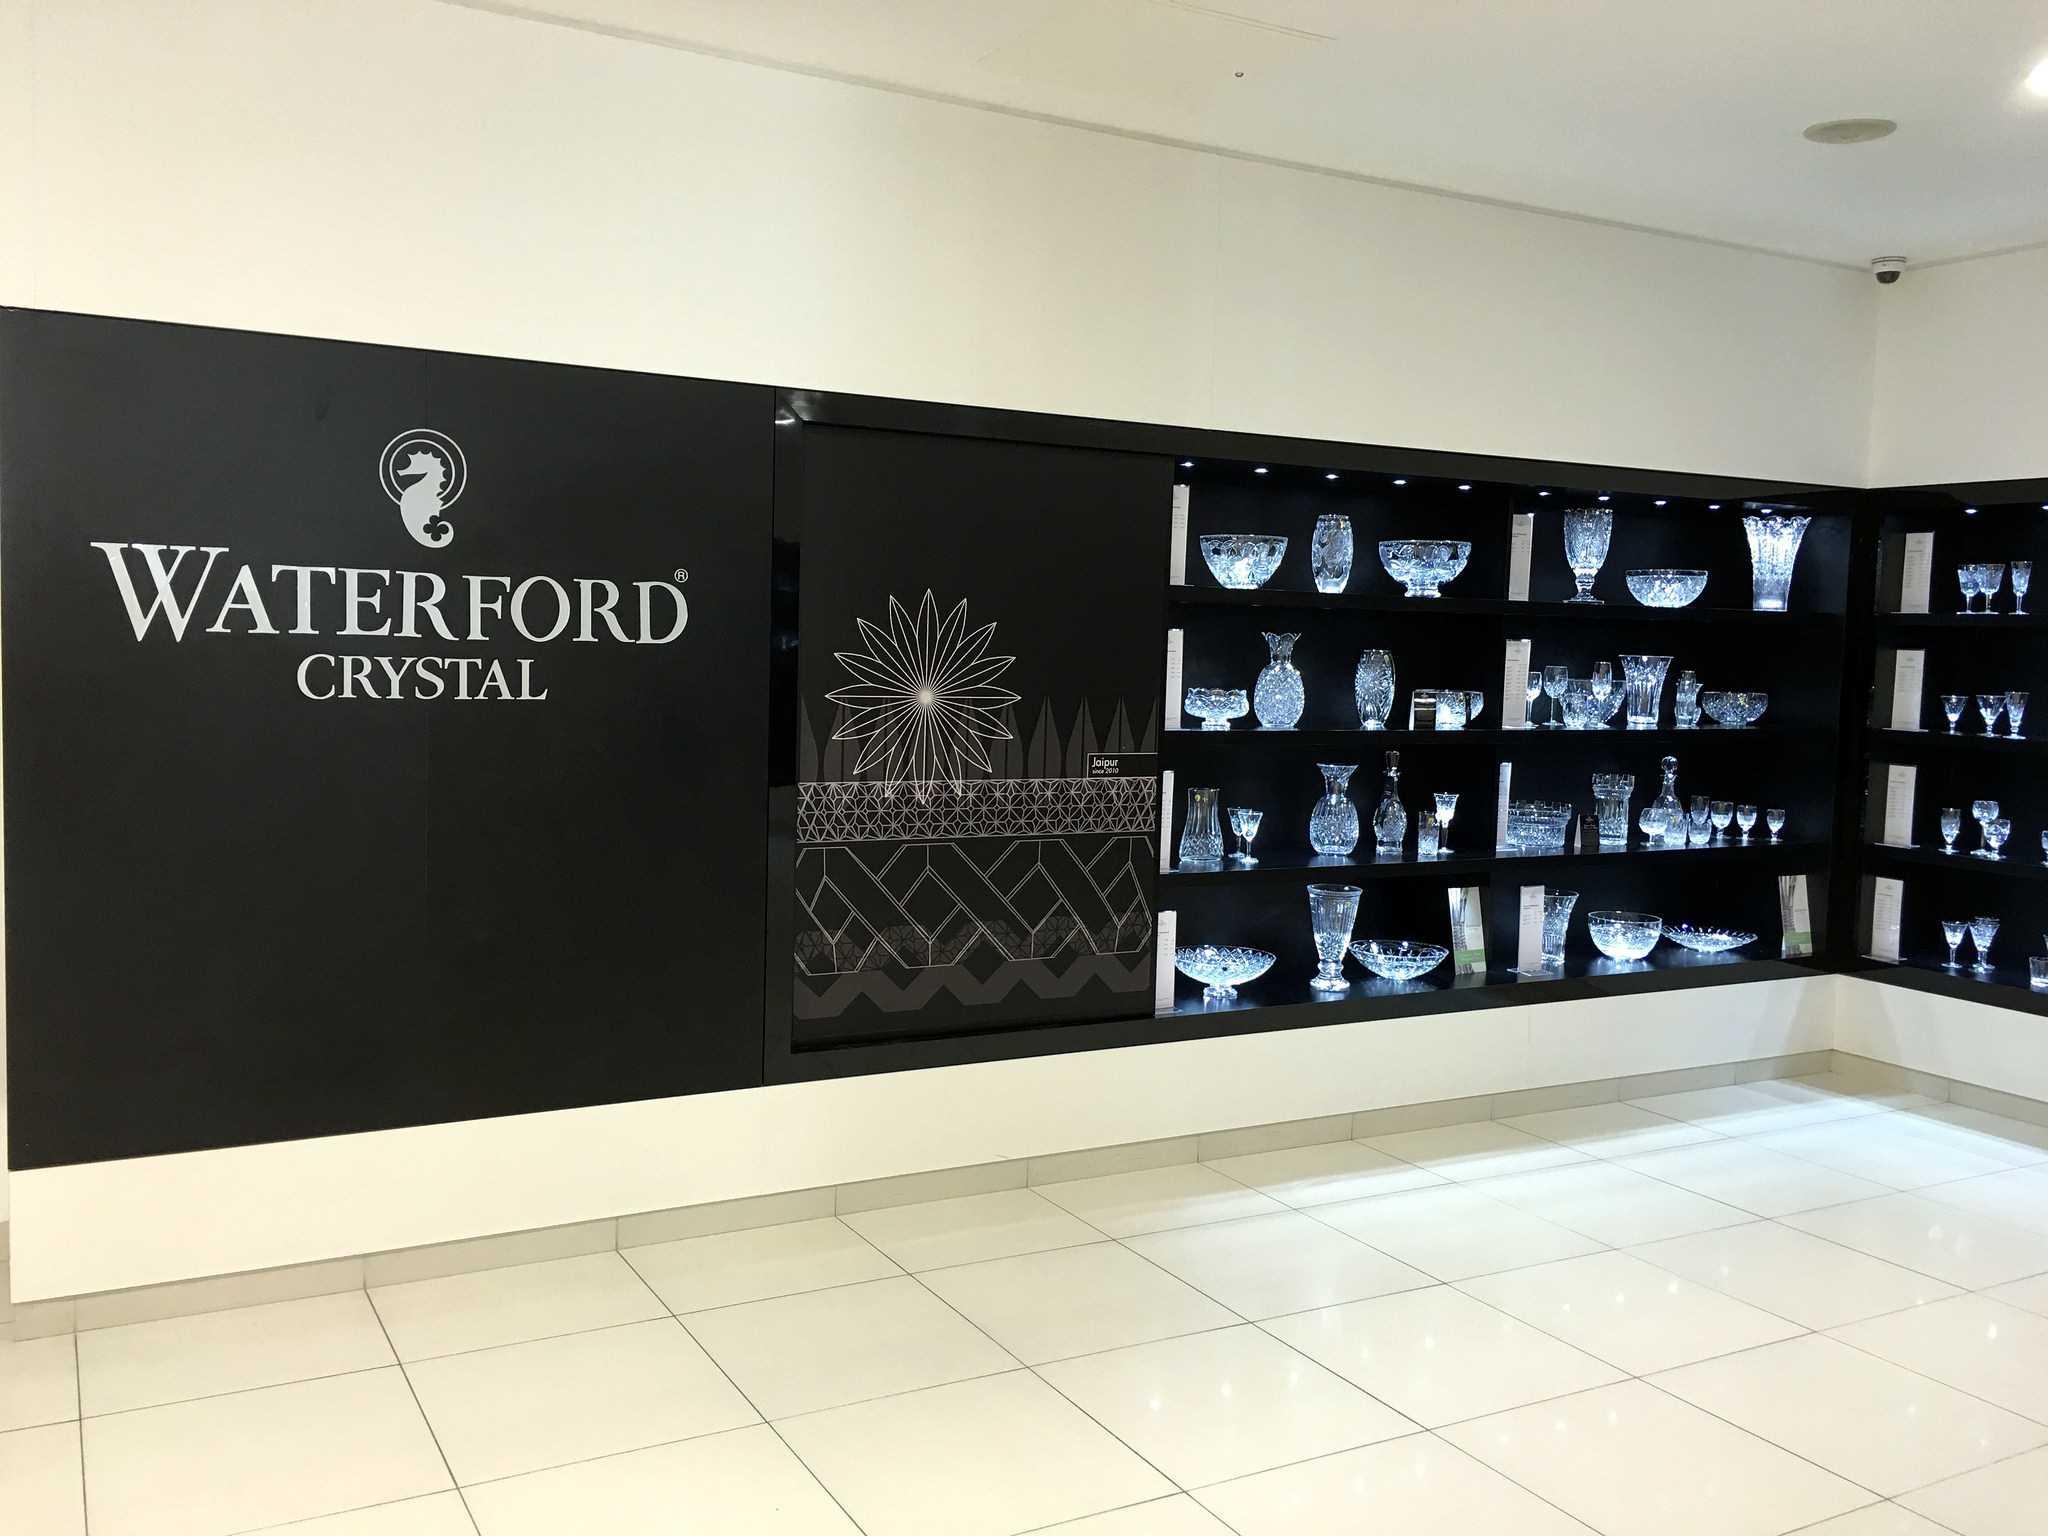 Waterford Crystal, Ireland